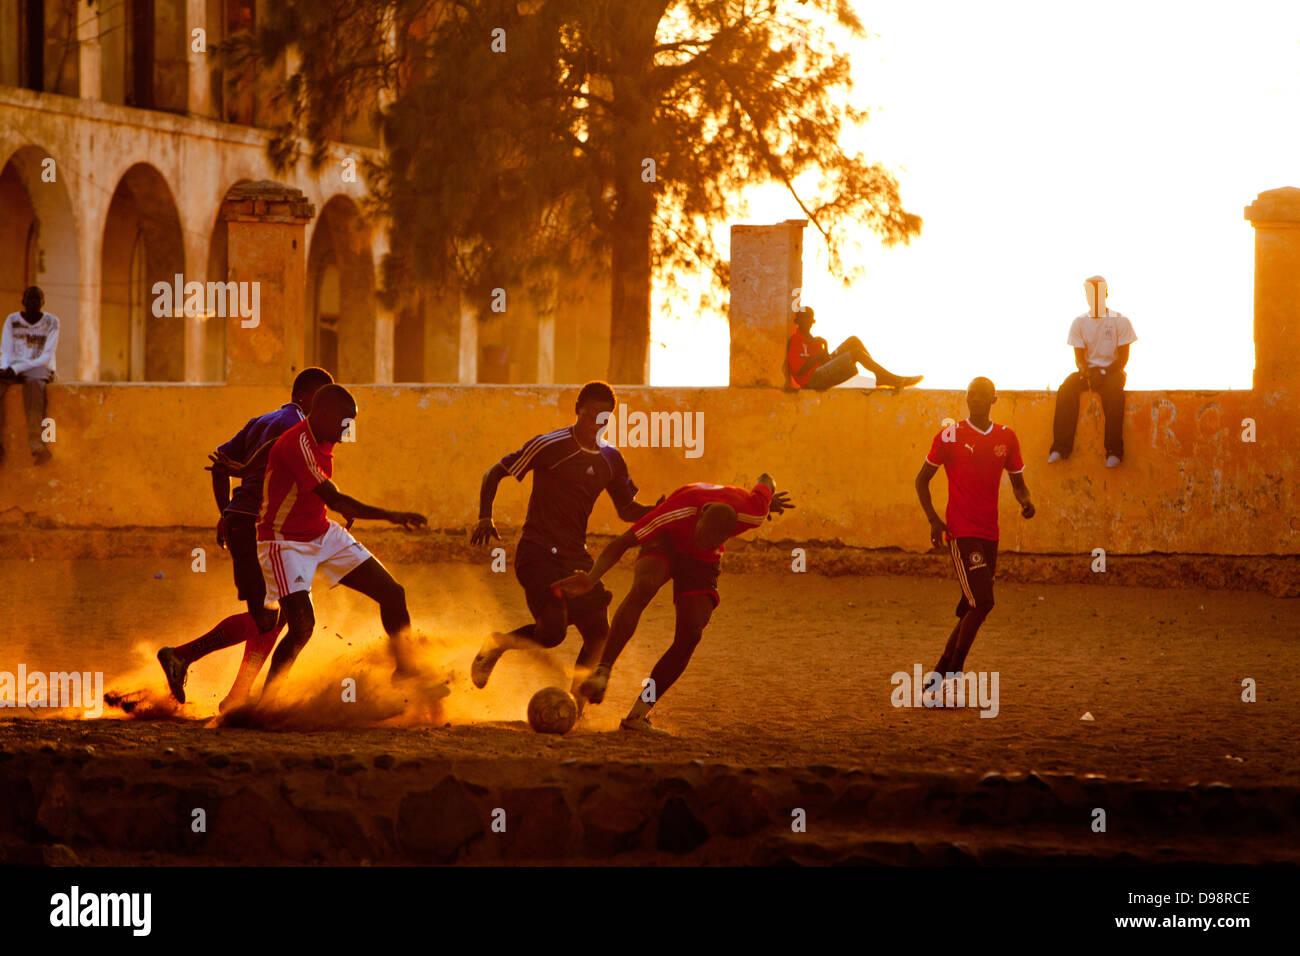 Football on the main square of Goree island, Dakar, Senegal. - Stock Image